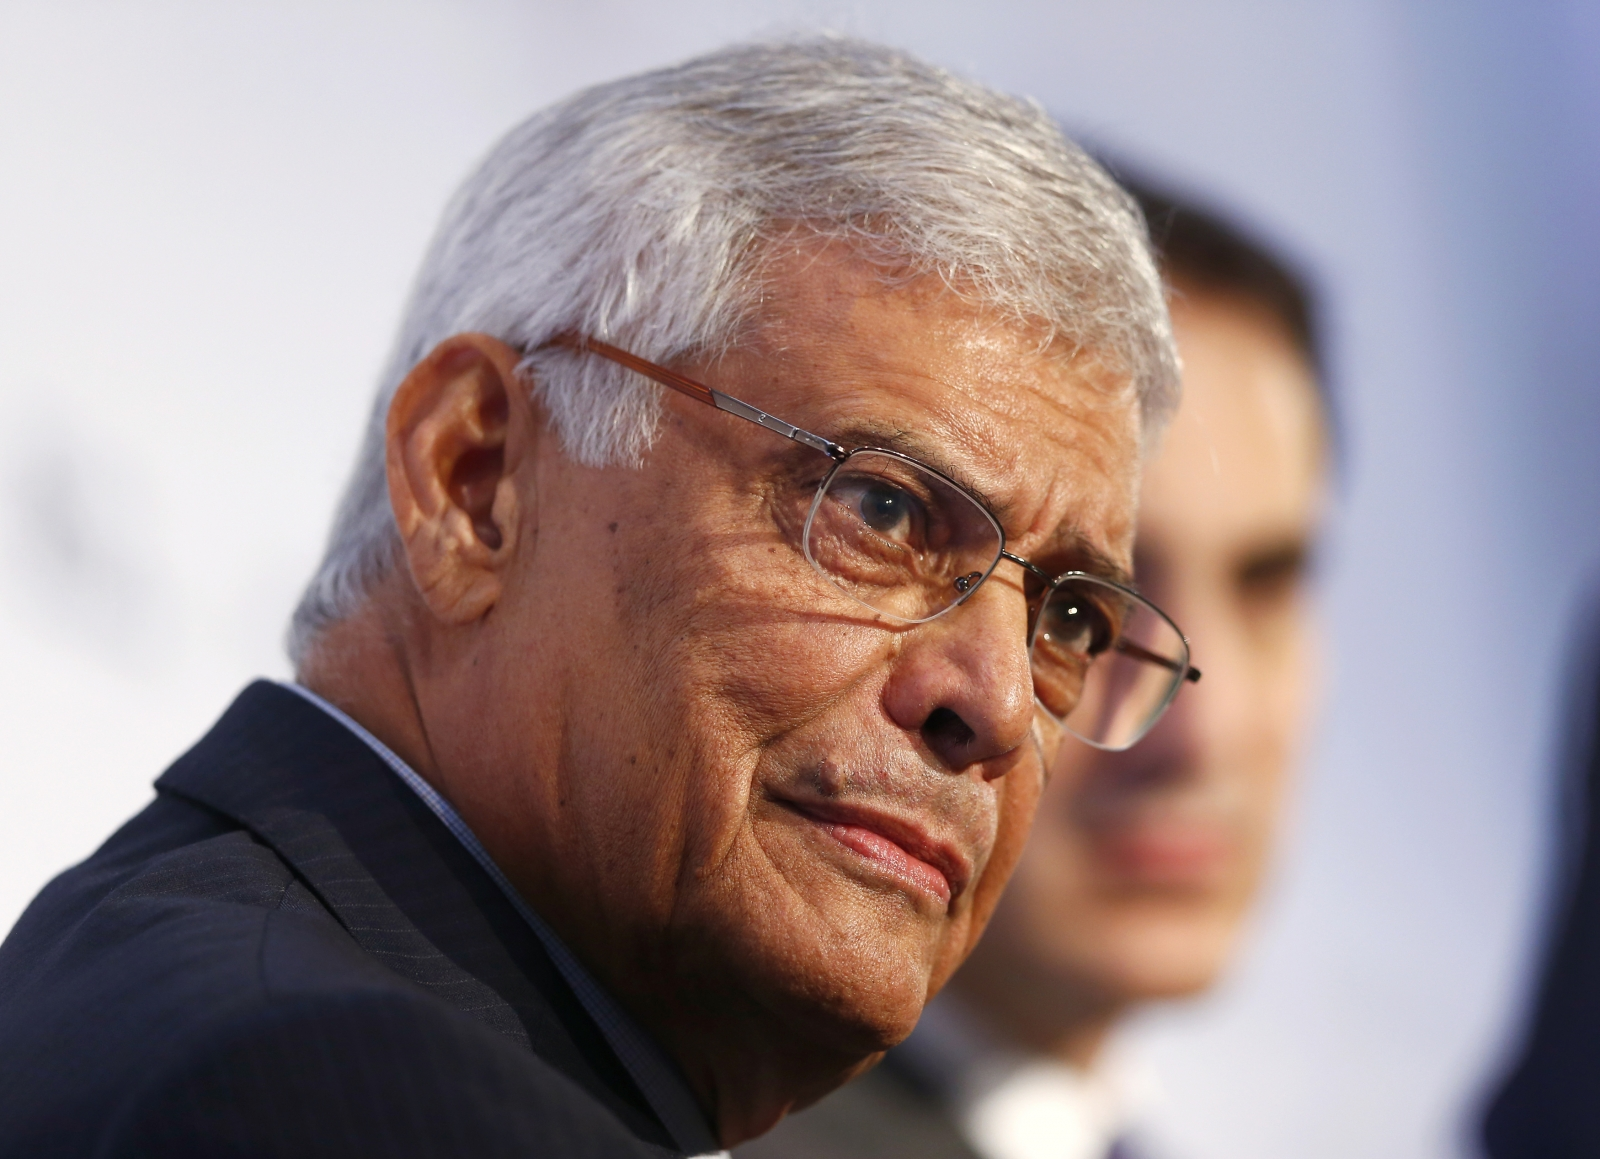 Opec secretary general Abdullah al-Badri